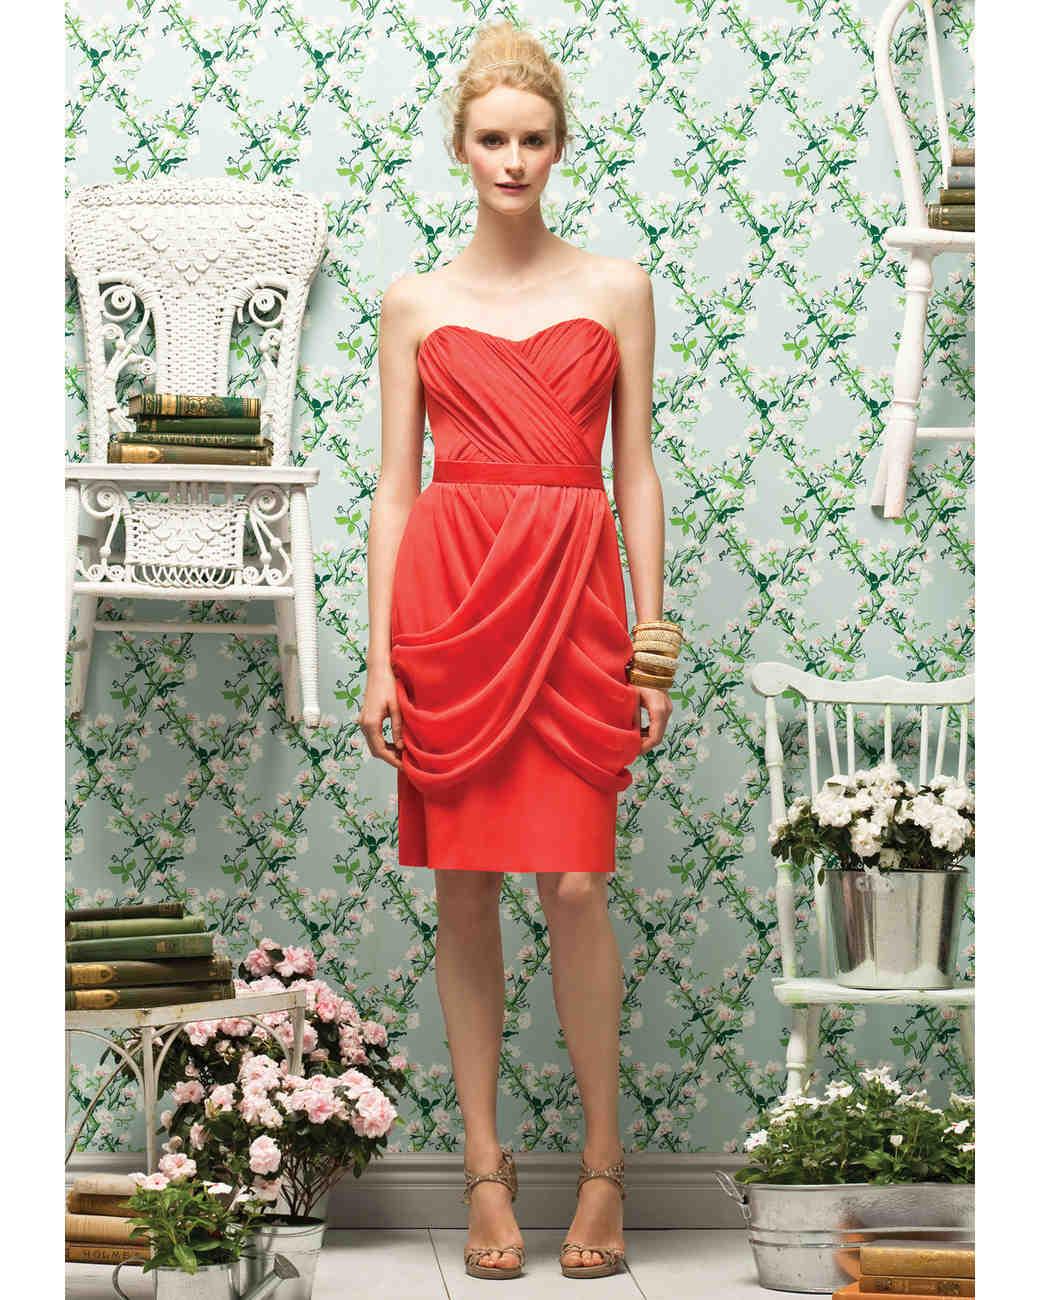 dessy-group-bridal-lela-rose-bridesmaids-dresses-3.jpg